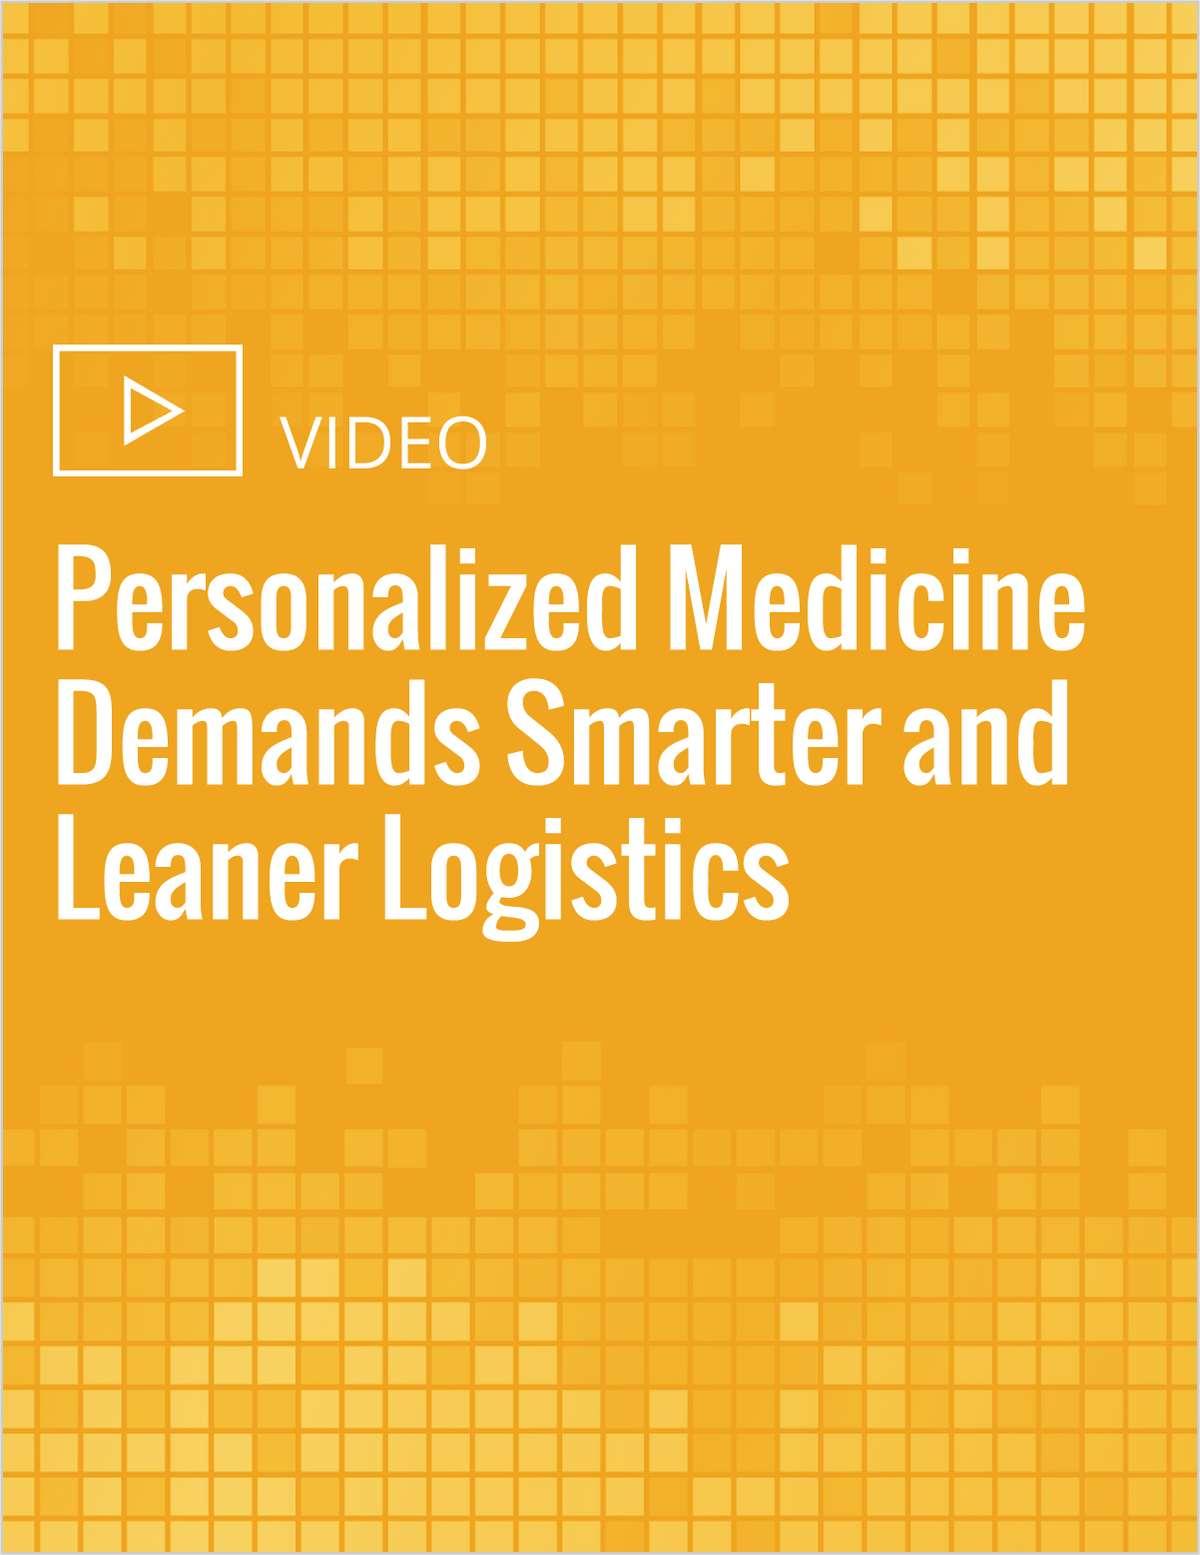 Personalized Medicine Demands Smarter and Leaner Logistics